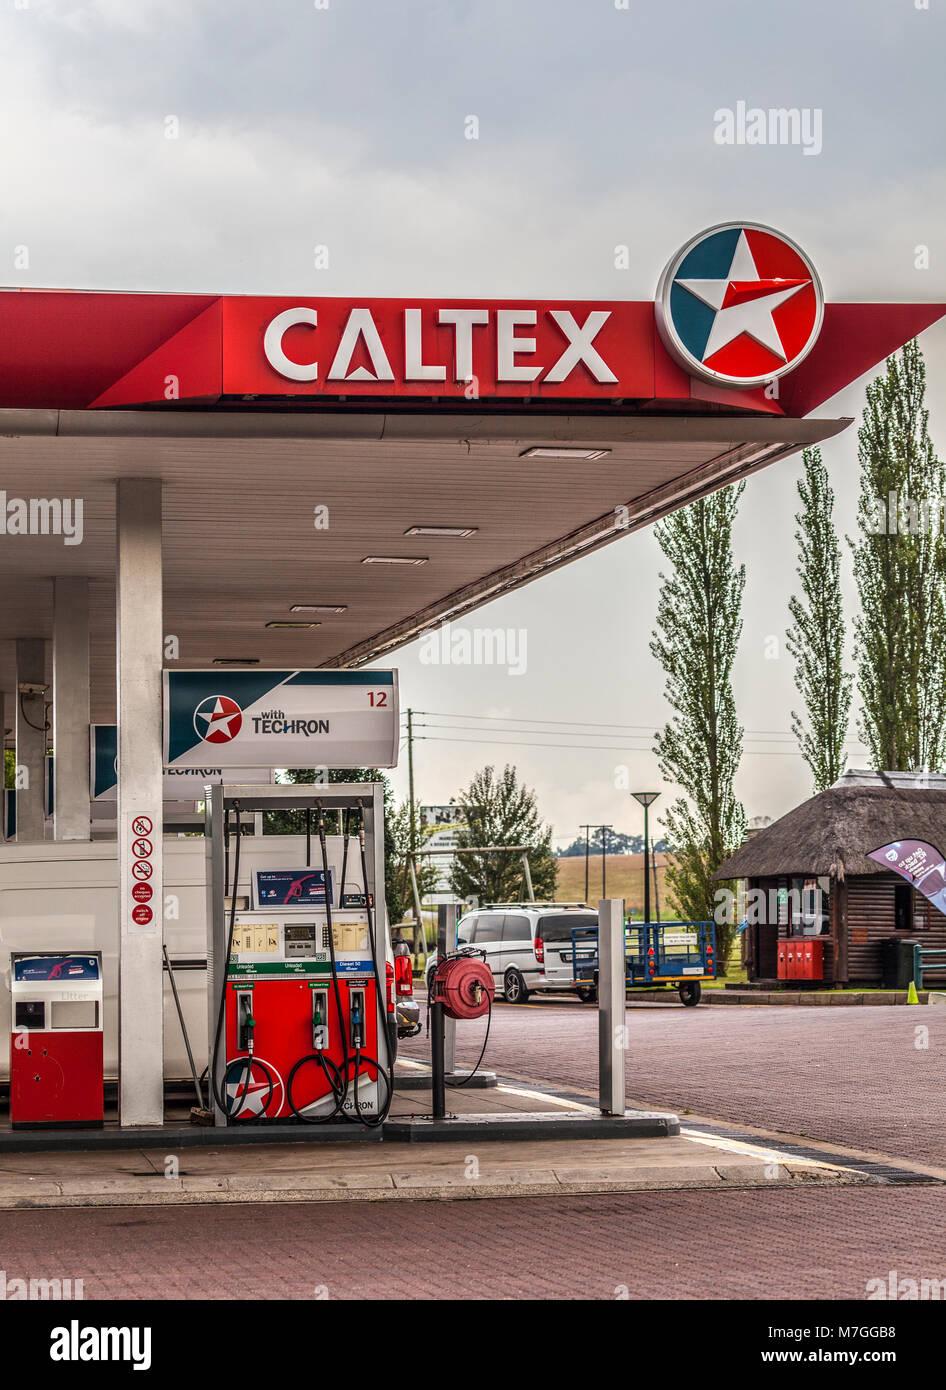 Caltex in south africa